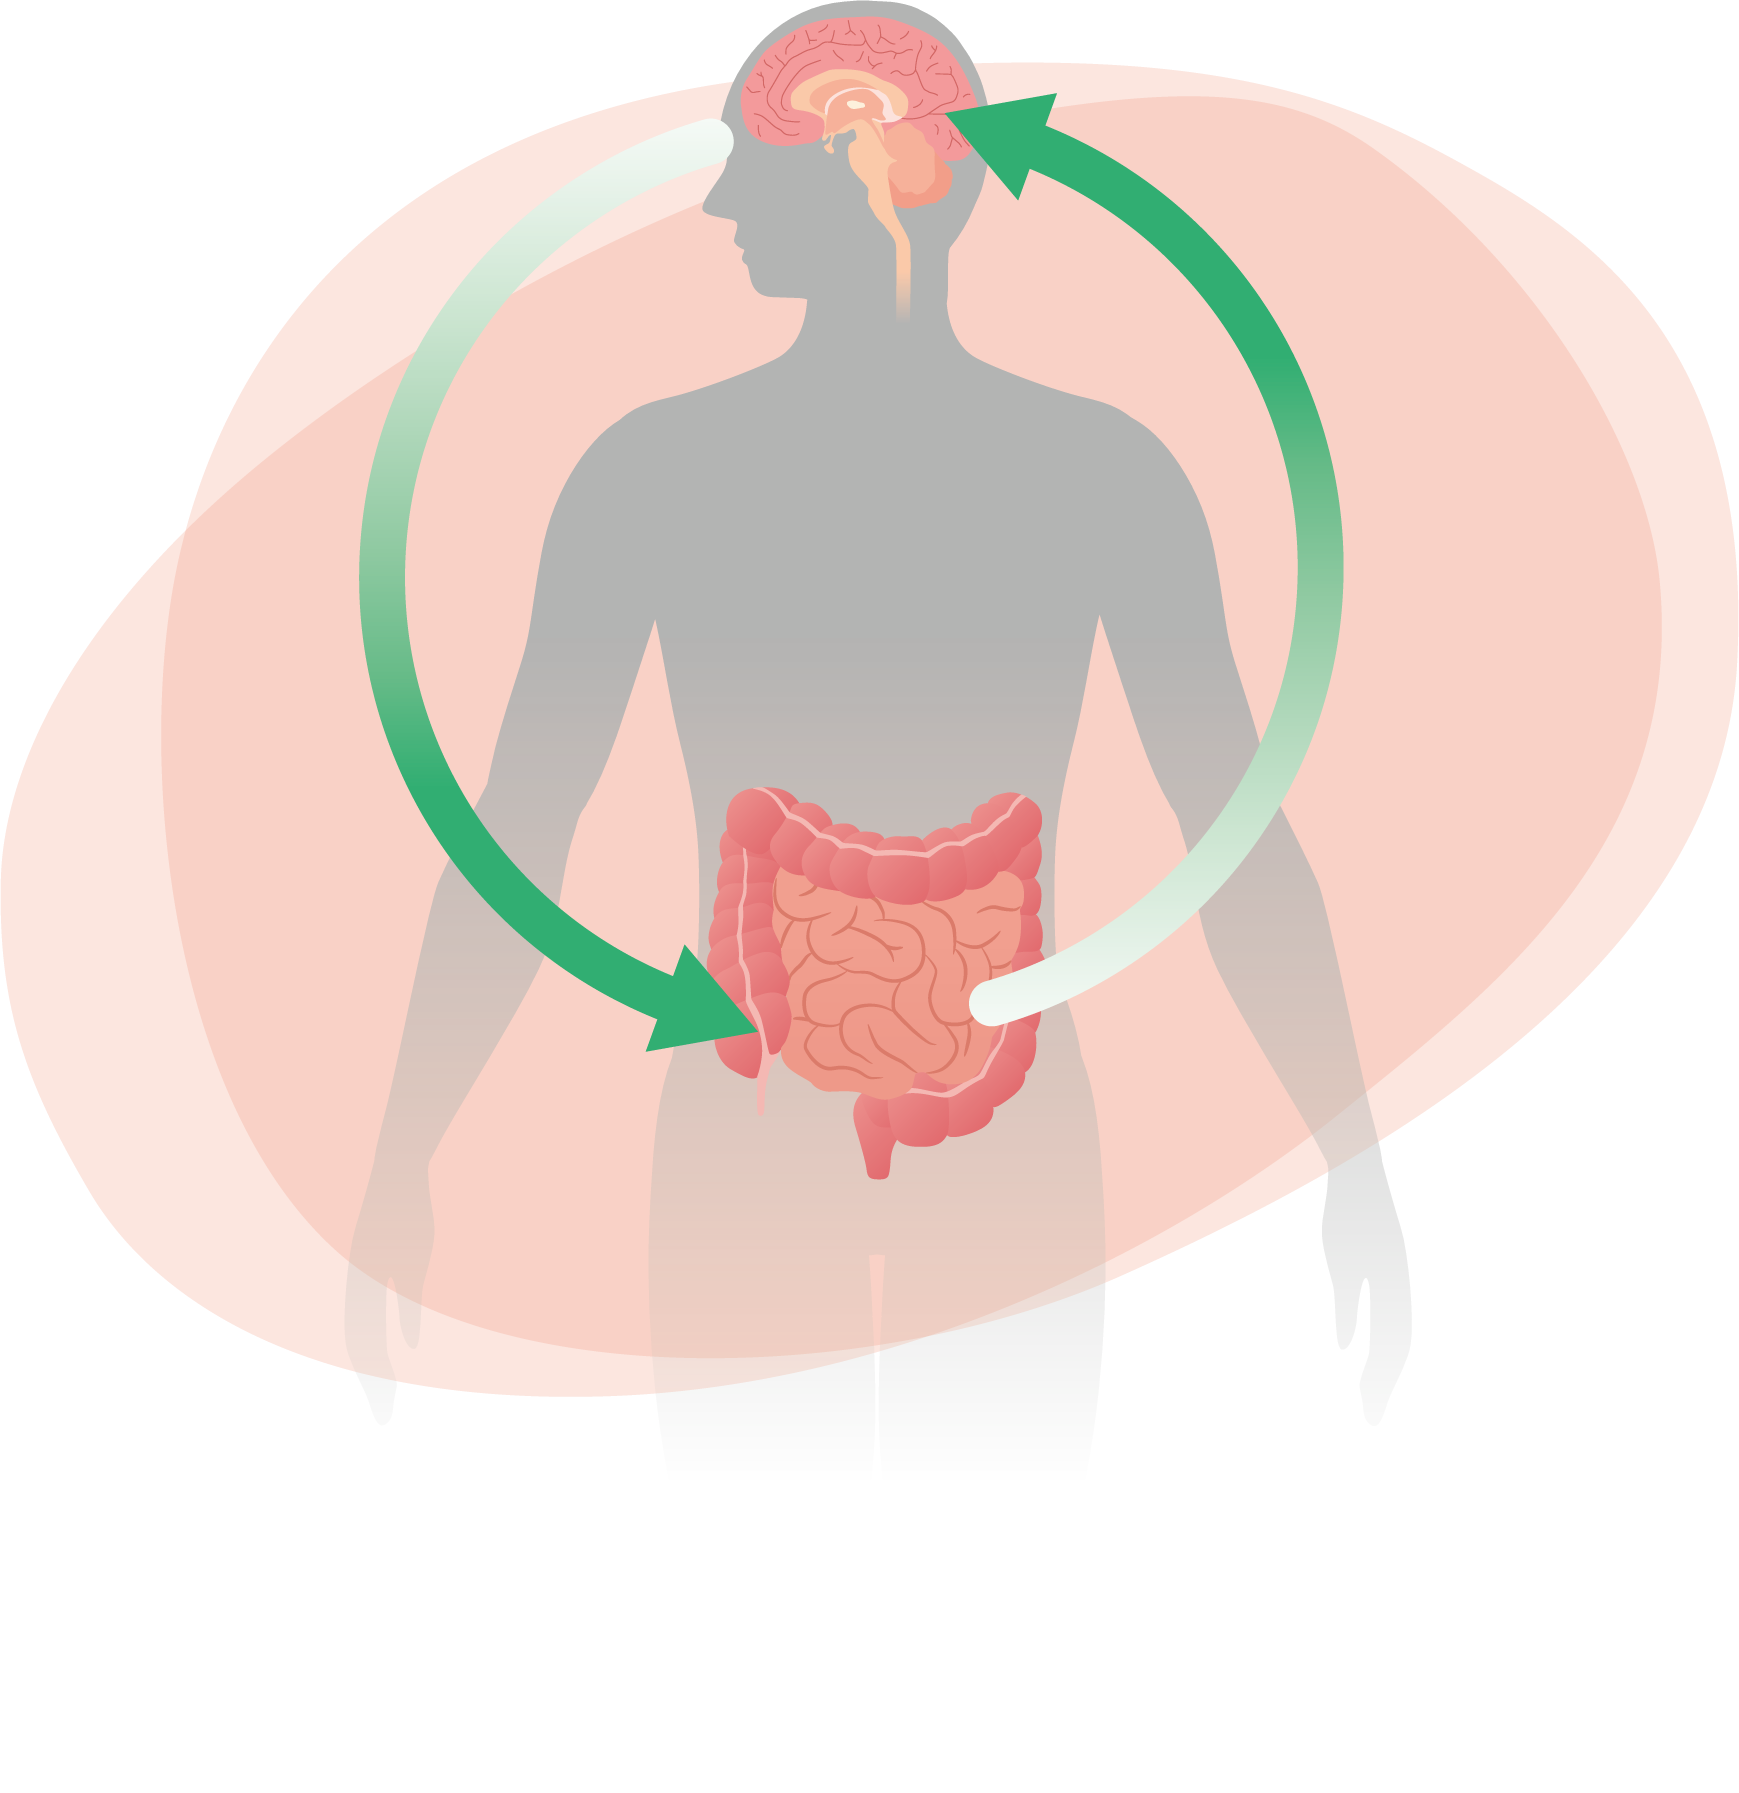 Reuflor Asse cervello intestino